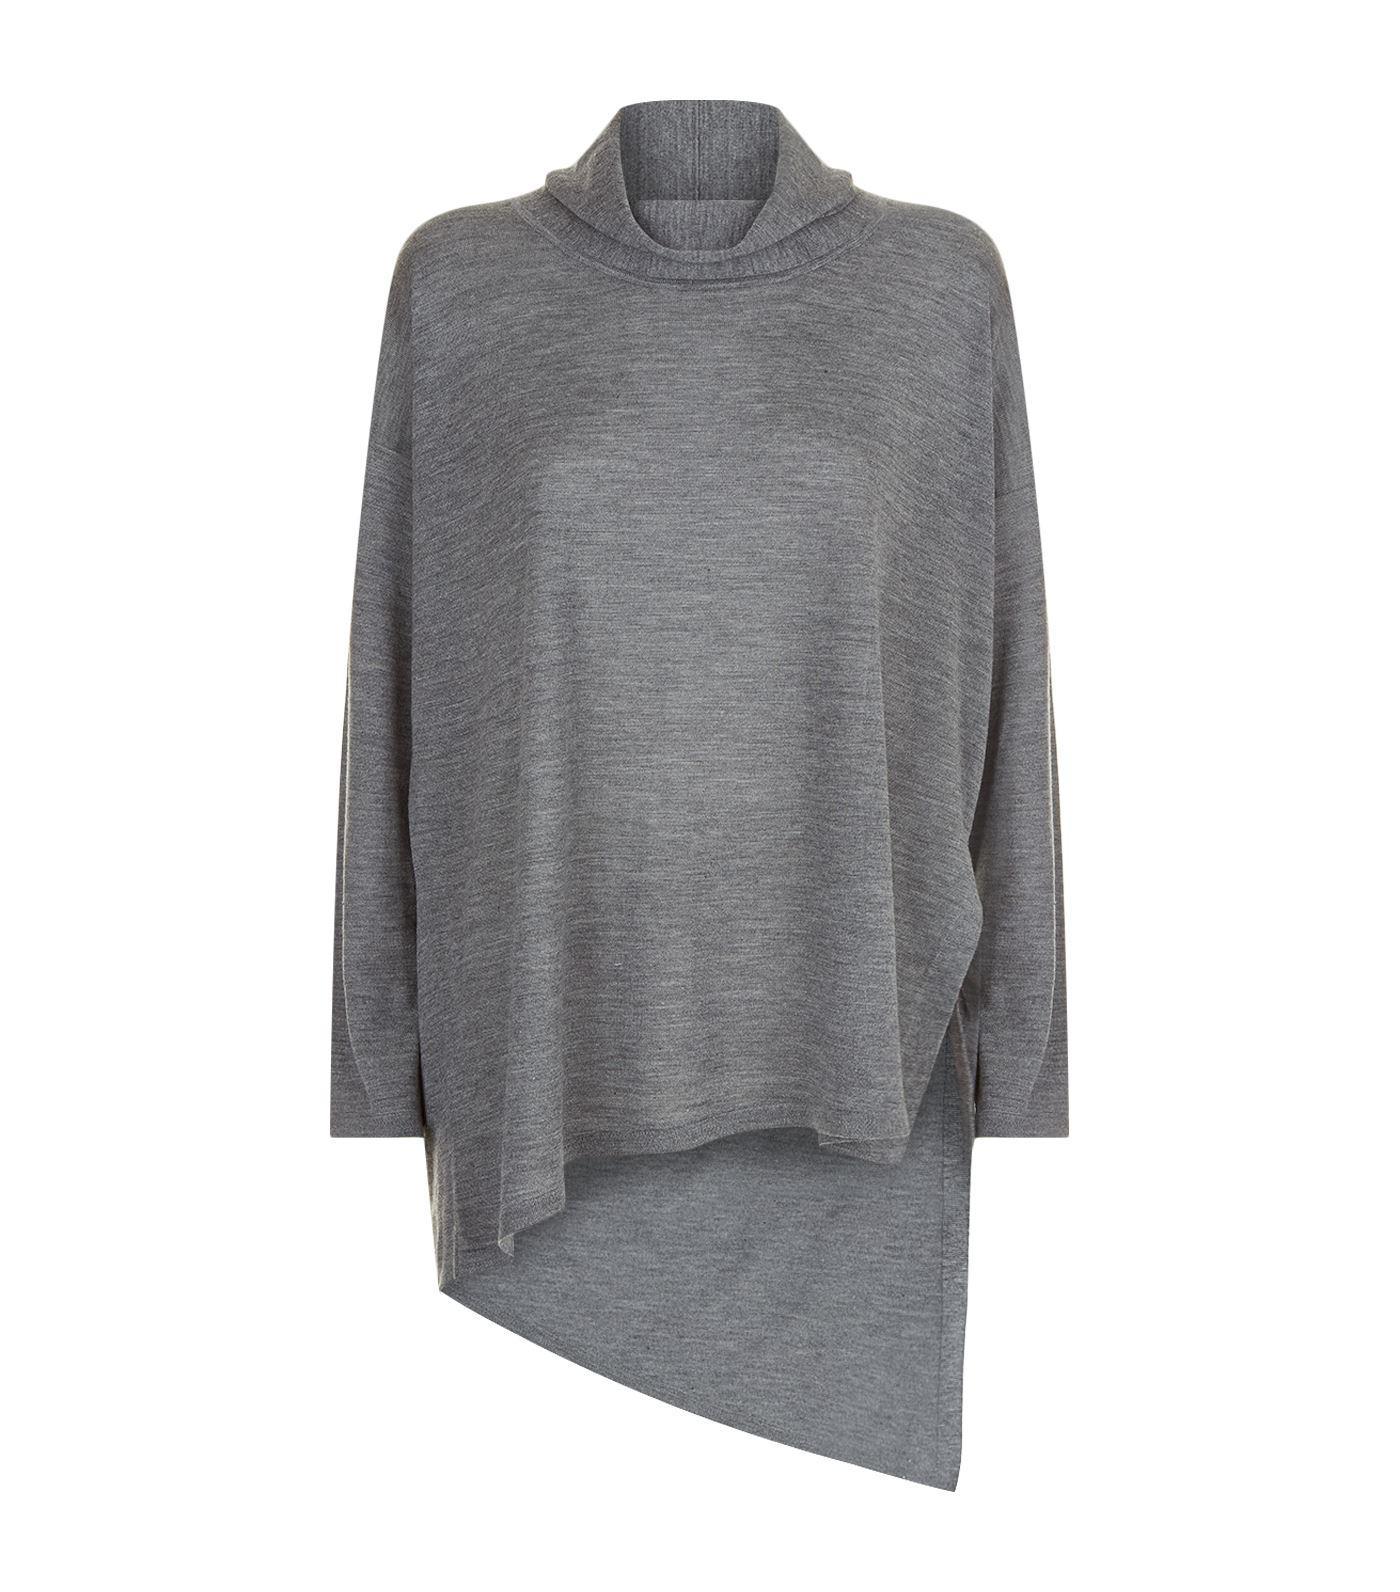 14c84470870dc Eileen Fisher High-Low Ultrafine Merino Wool Top In Ash